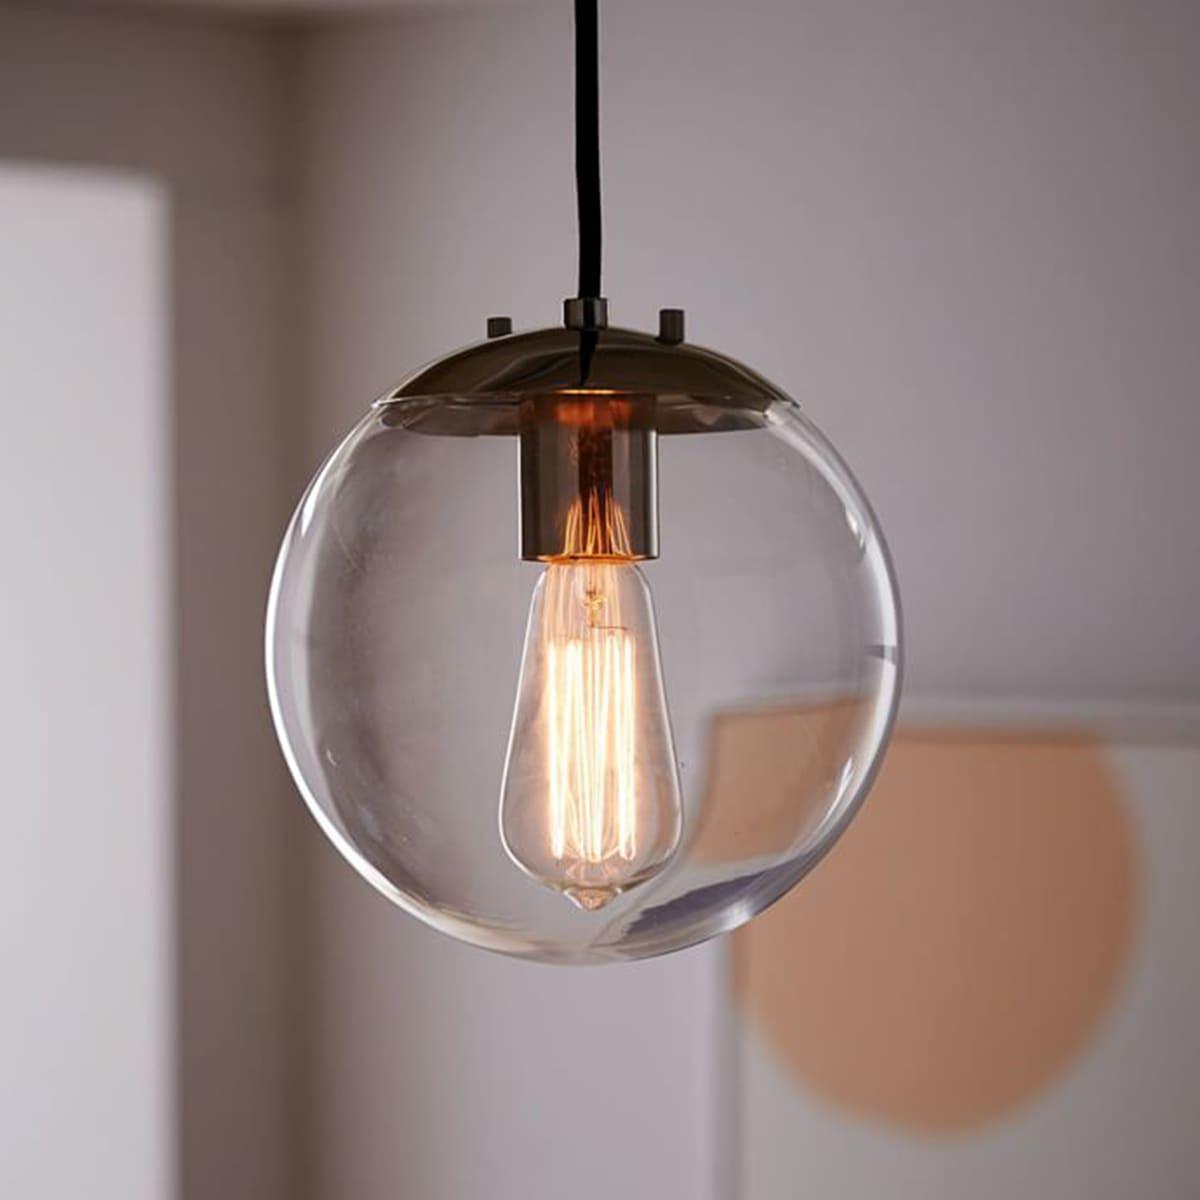 10 Budget-Friendly Kitchen Pendant Lights: gallery image 8